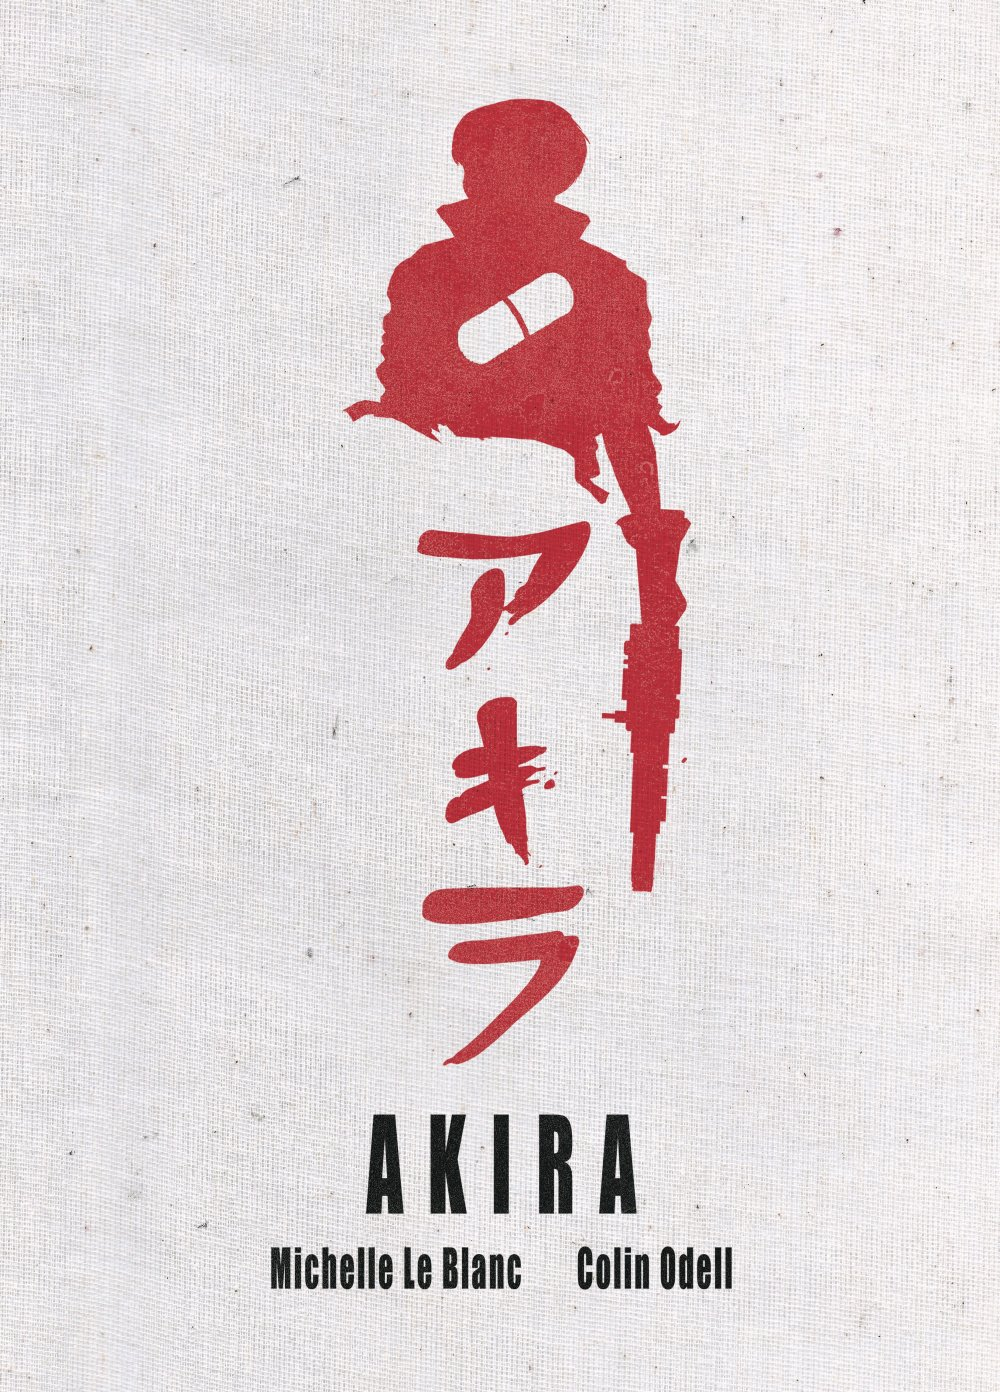 Commended design for the Akira cover by Isobel Mackenzie